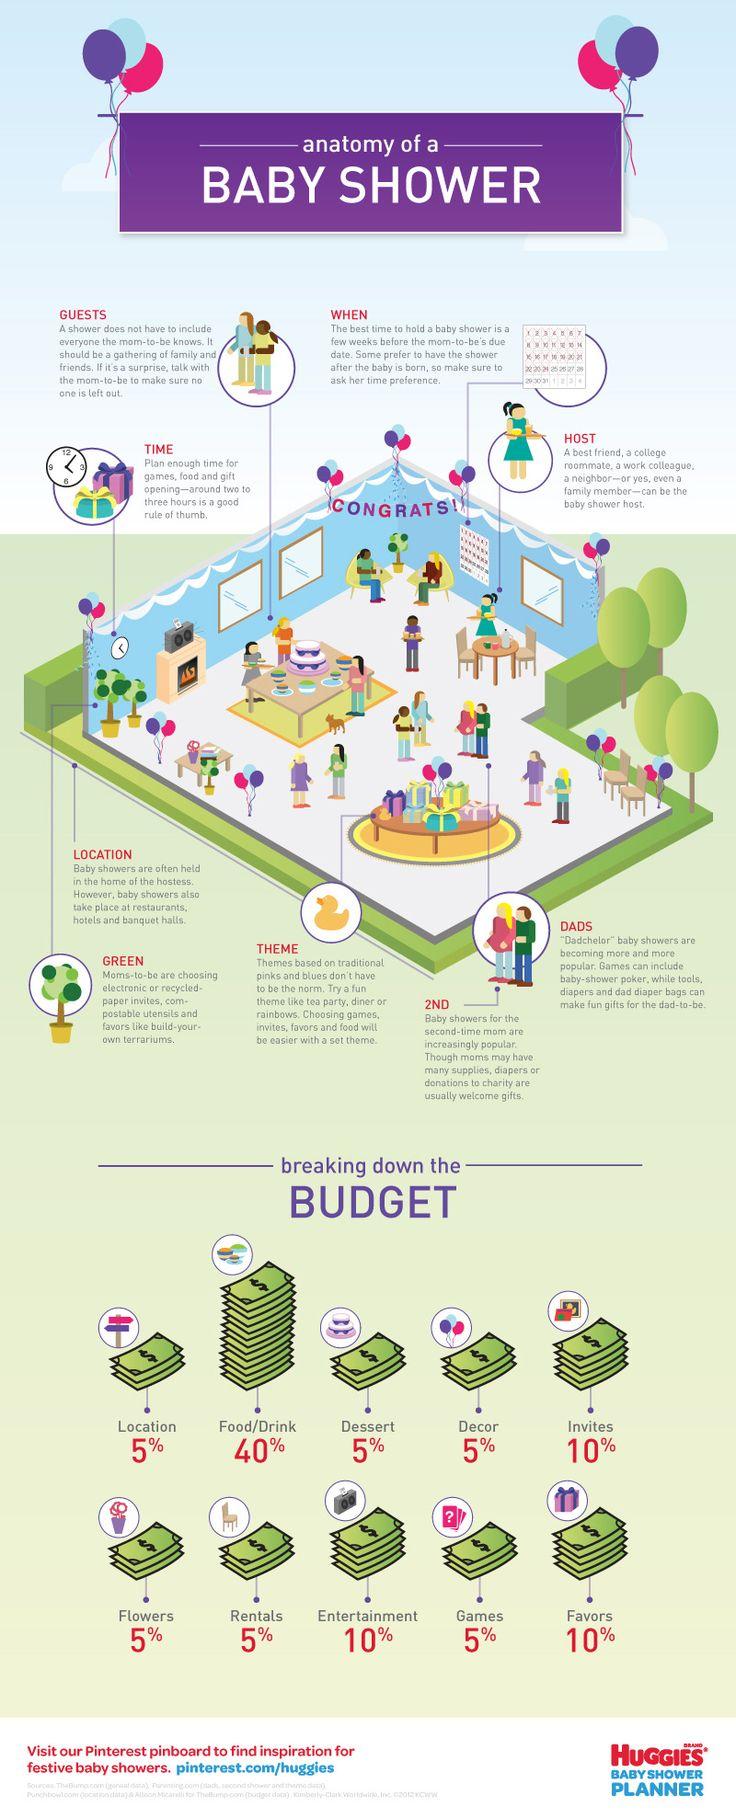 I like the budgeting example